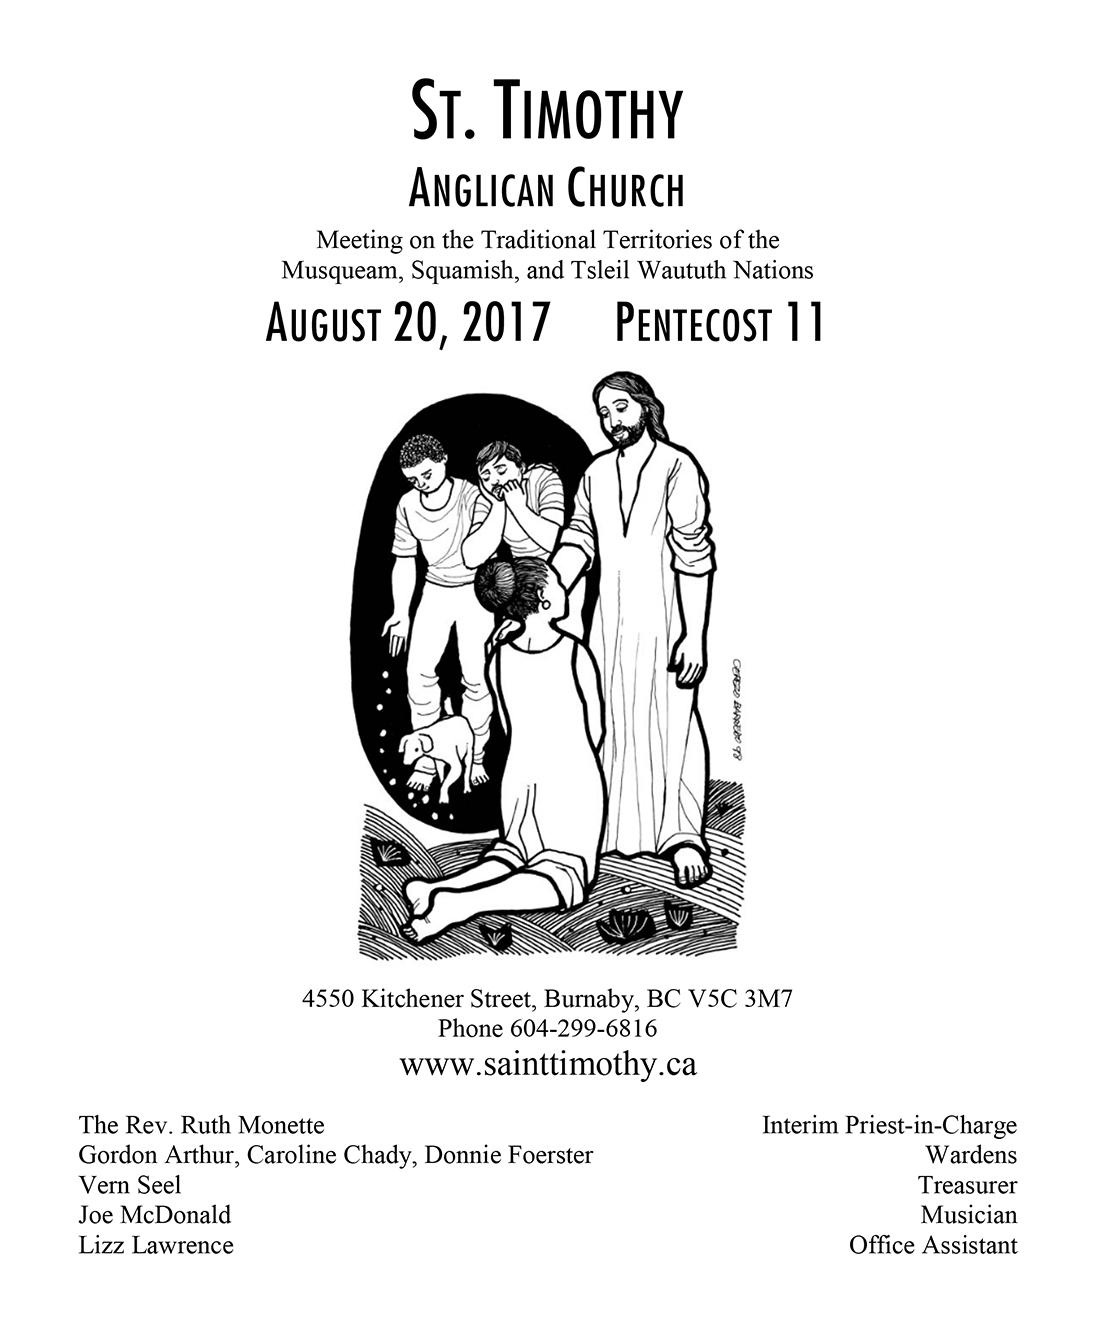 Bulletin: August 20, 2017